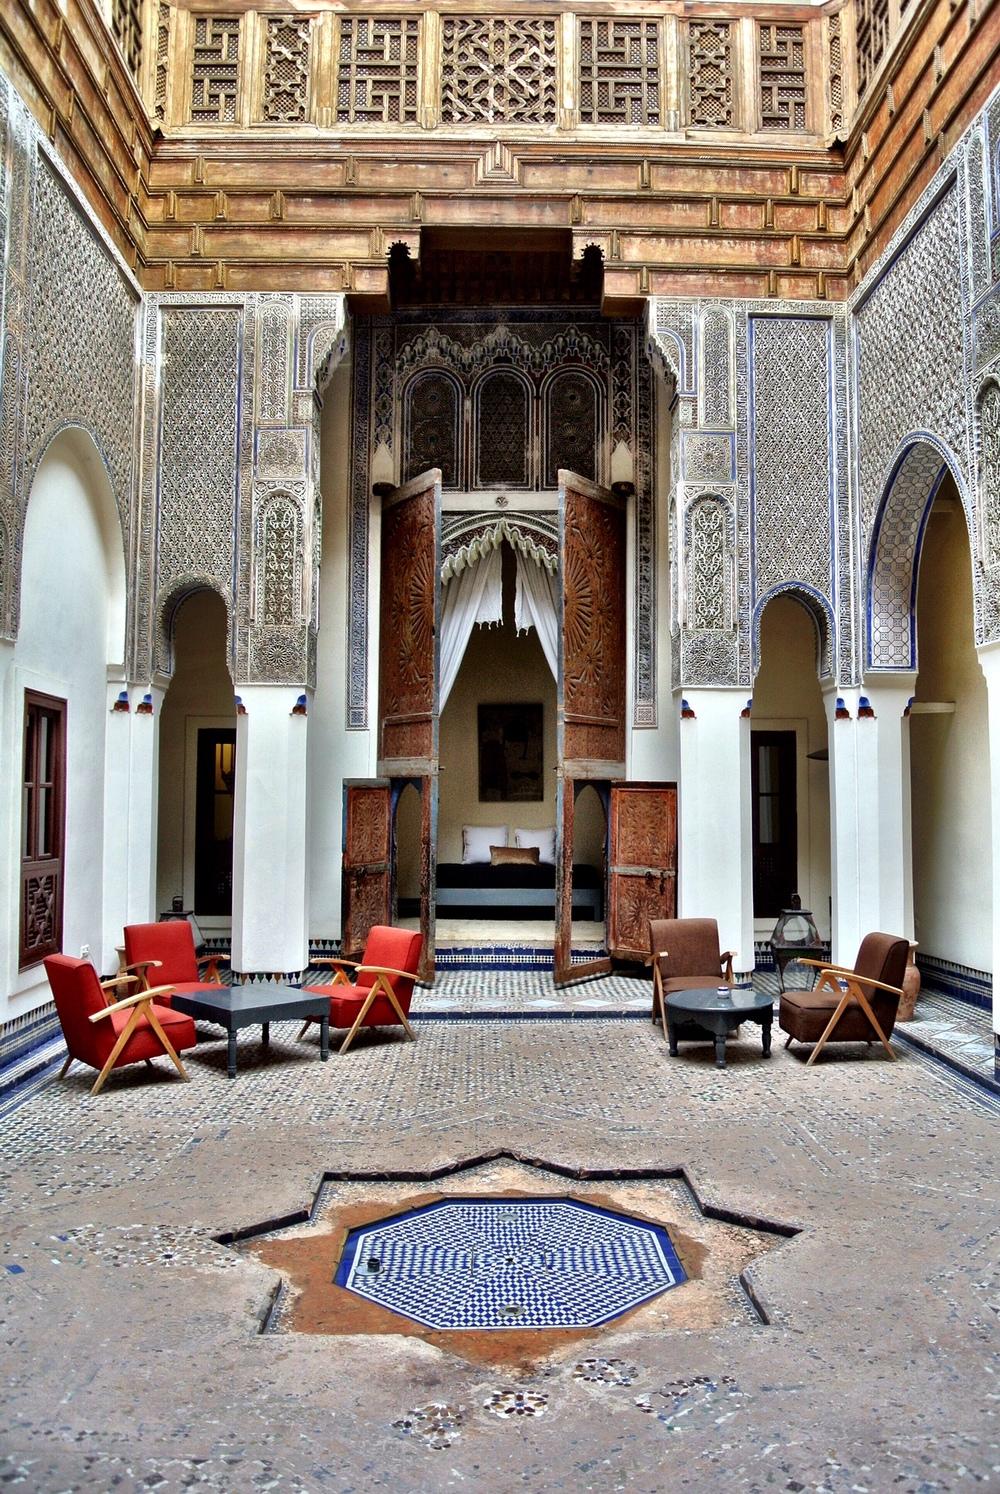 The stunning interior courtyard of Riad Dar Bensouda in Fès, Morocco